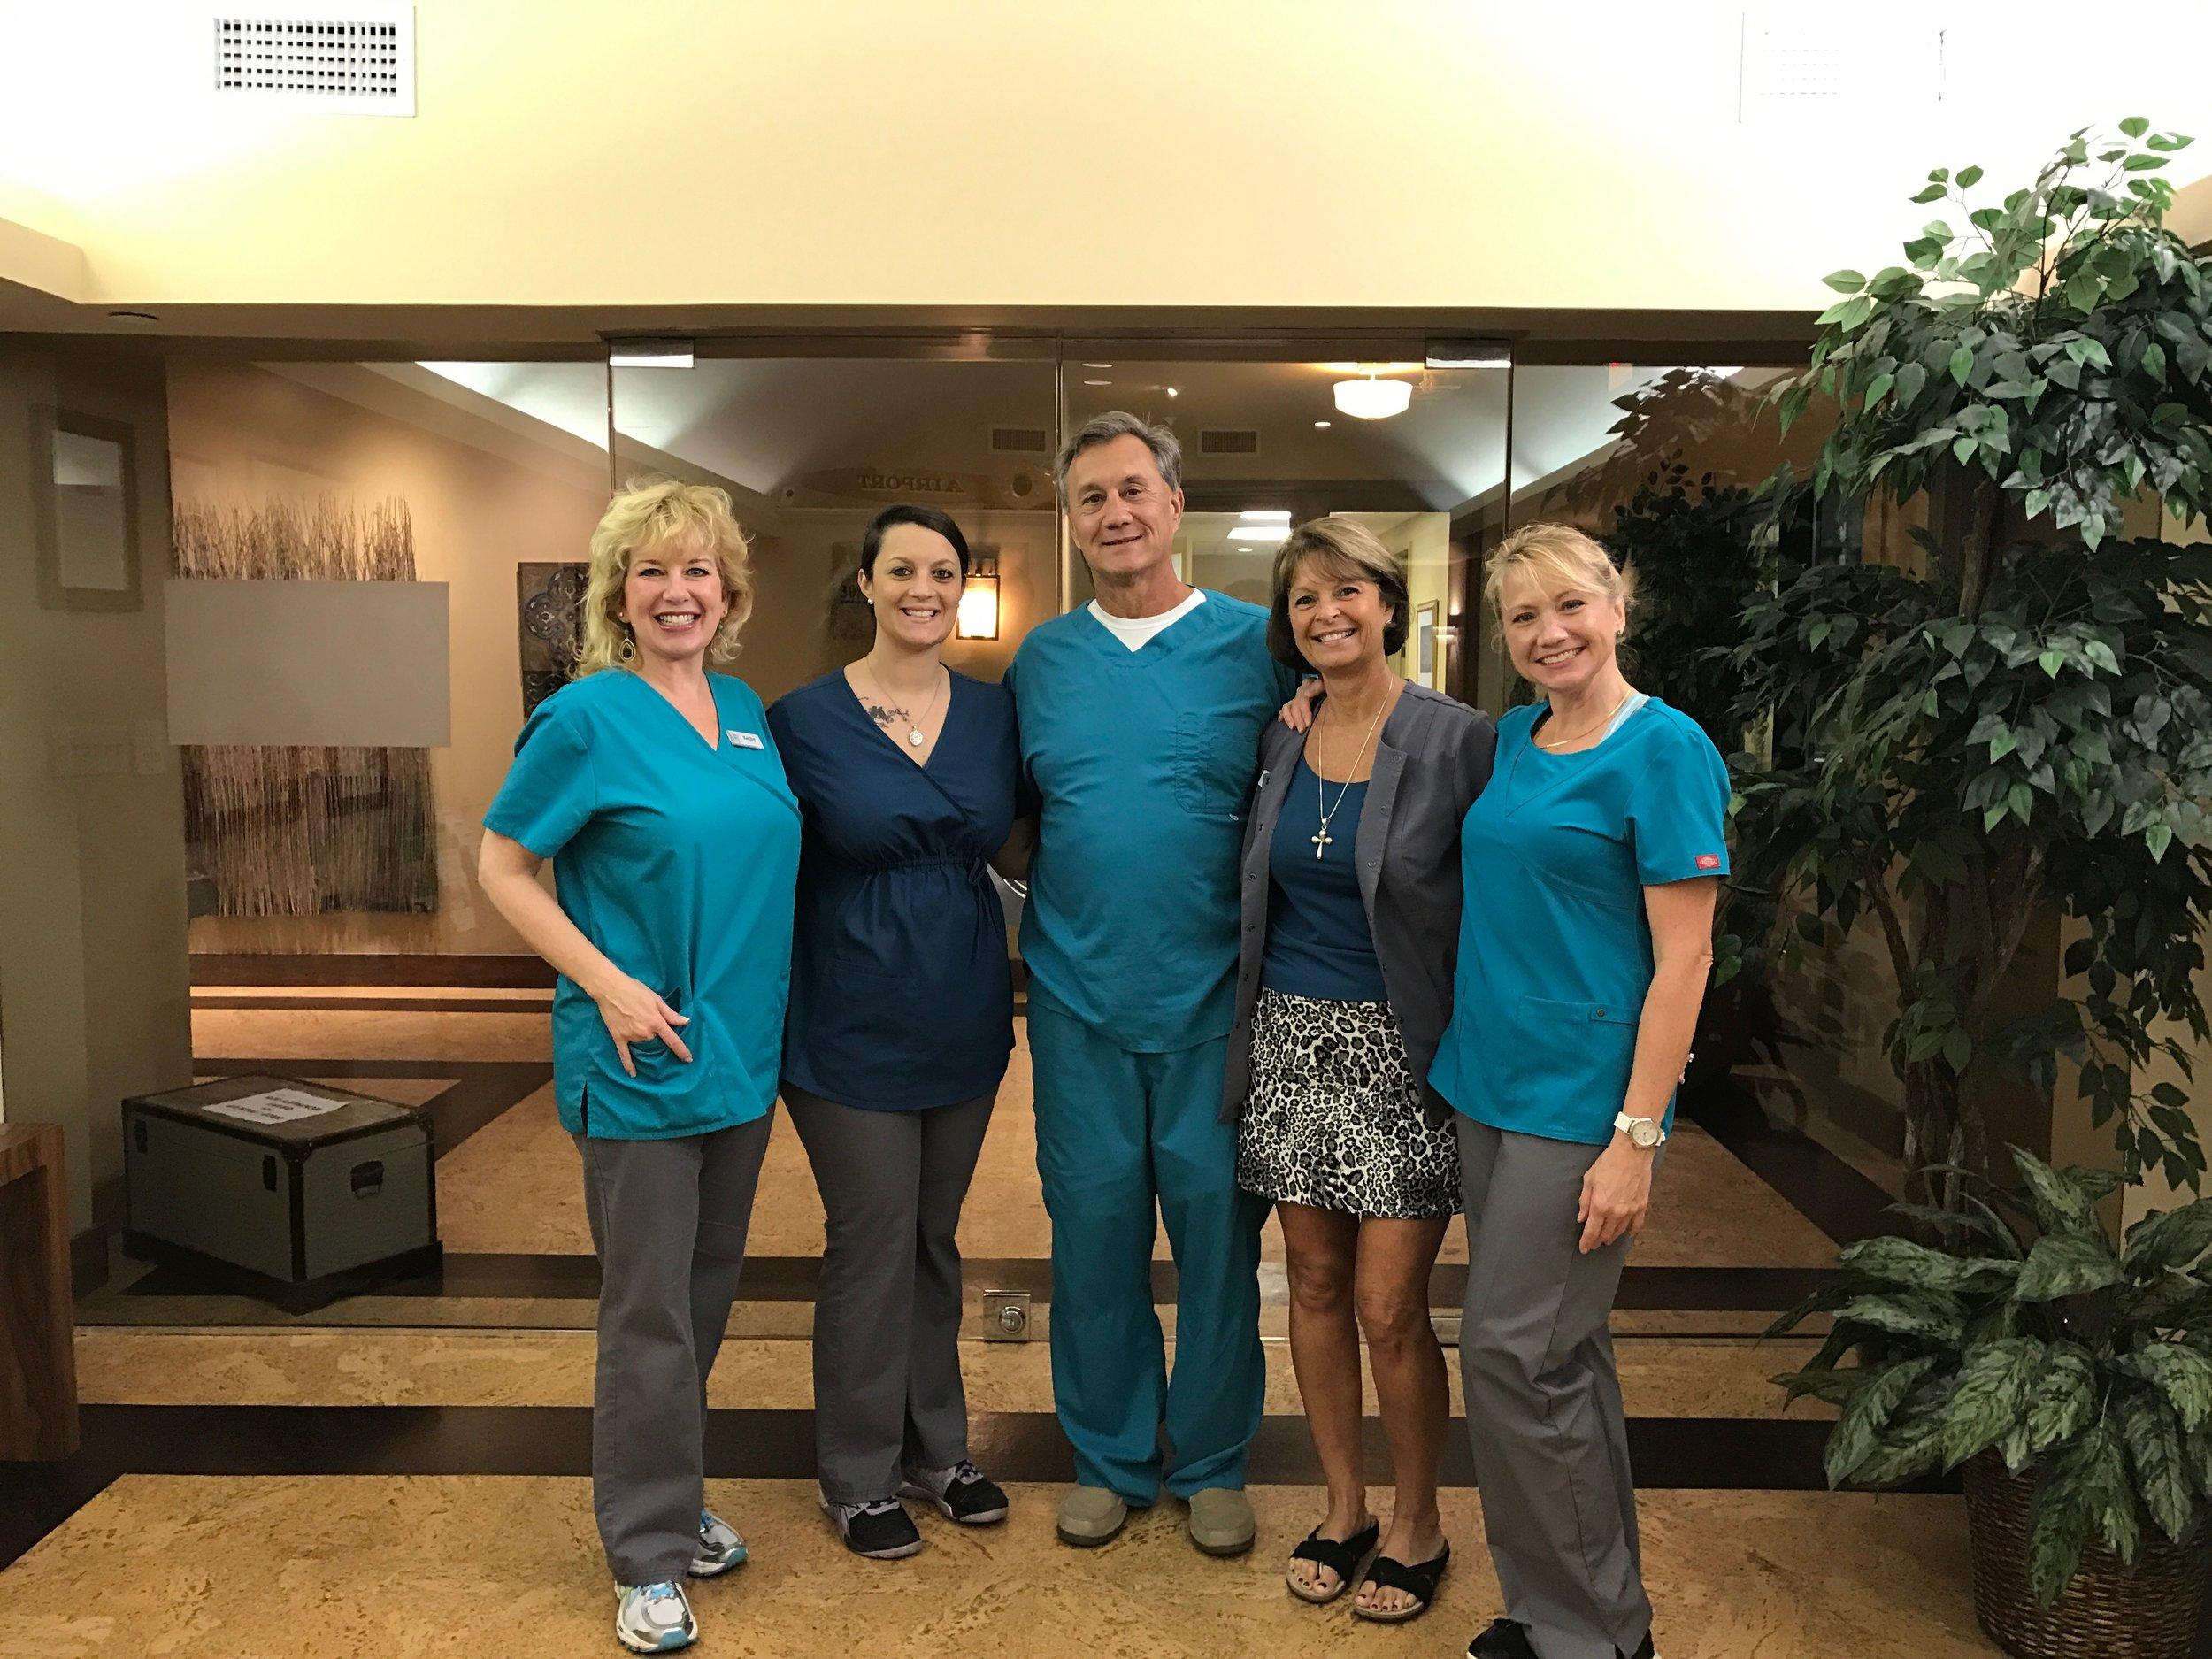 Dedicated team of Dental Professionals